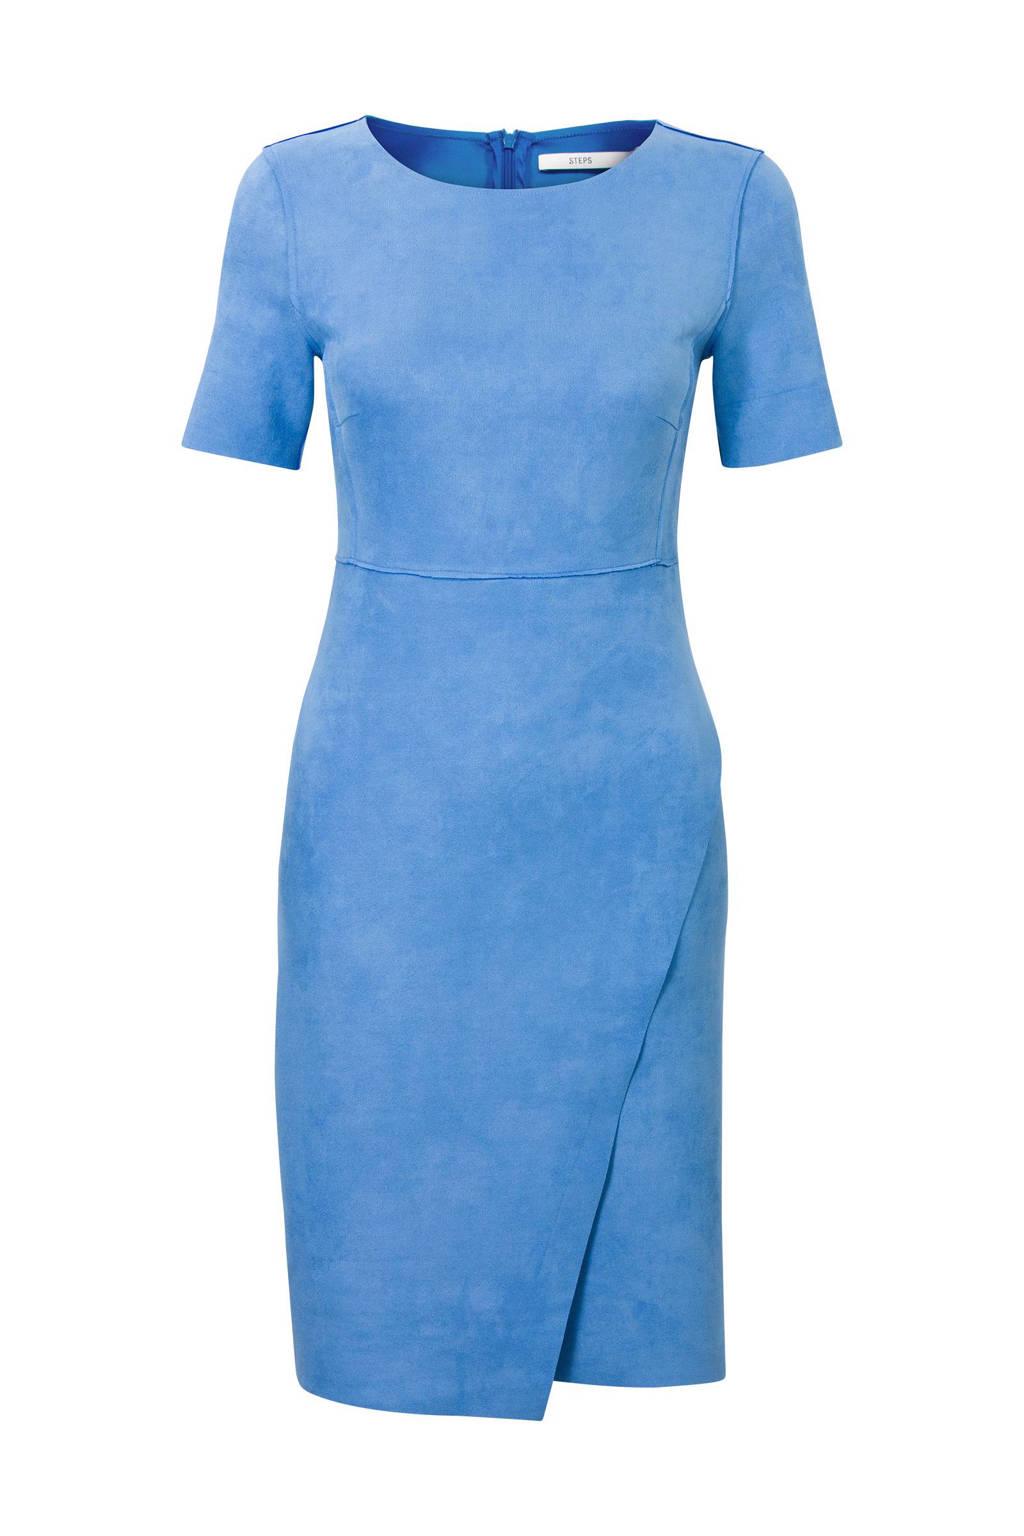 Steps suèdine jurk, Blauw